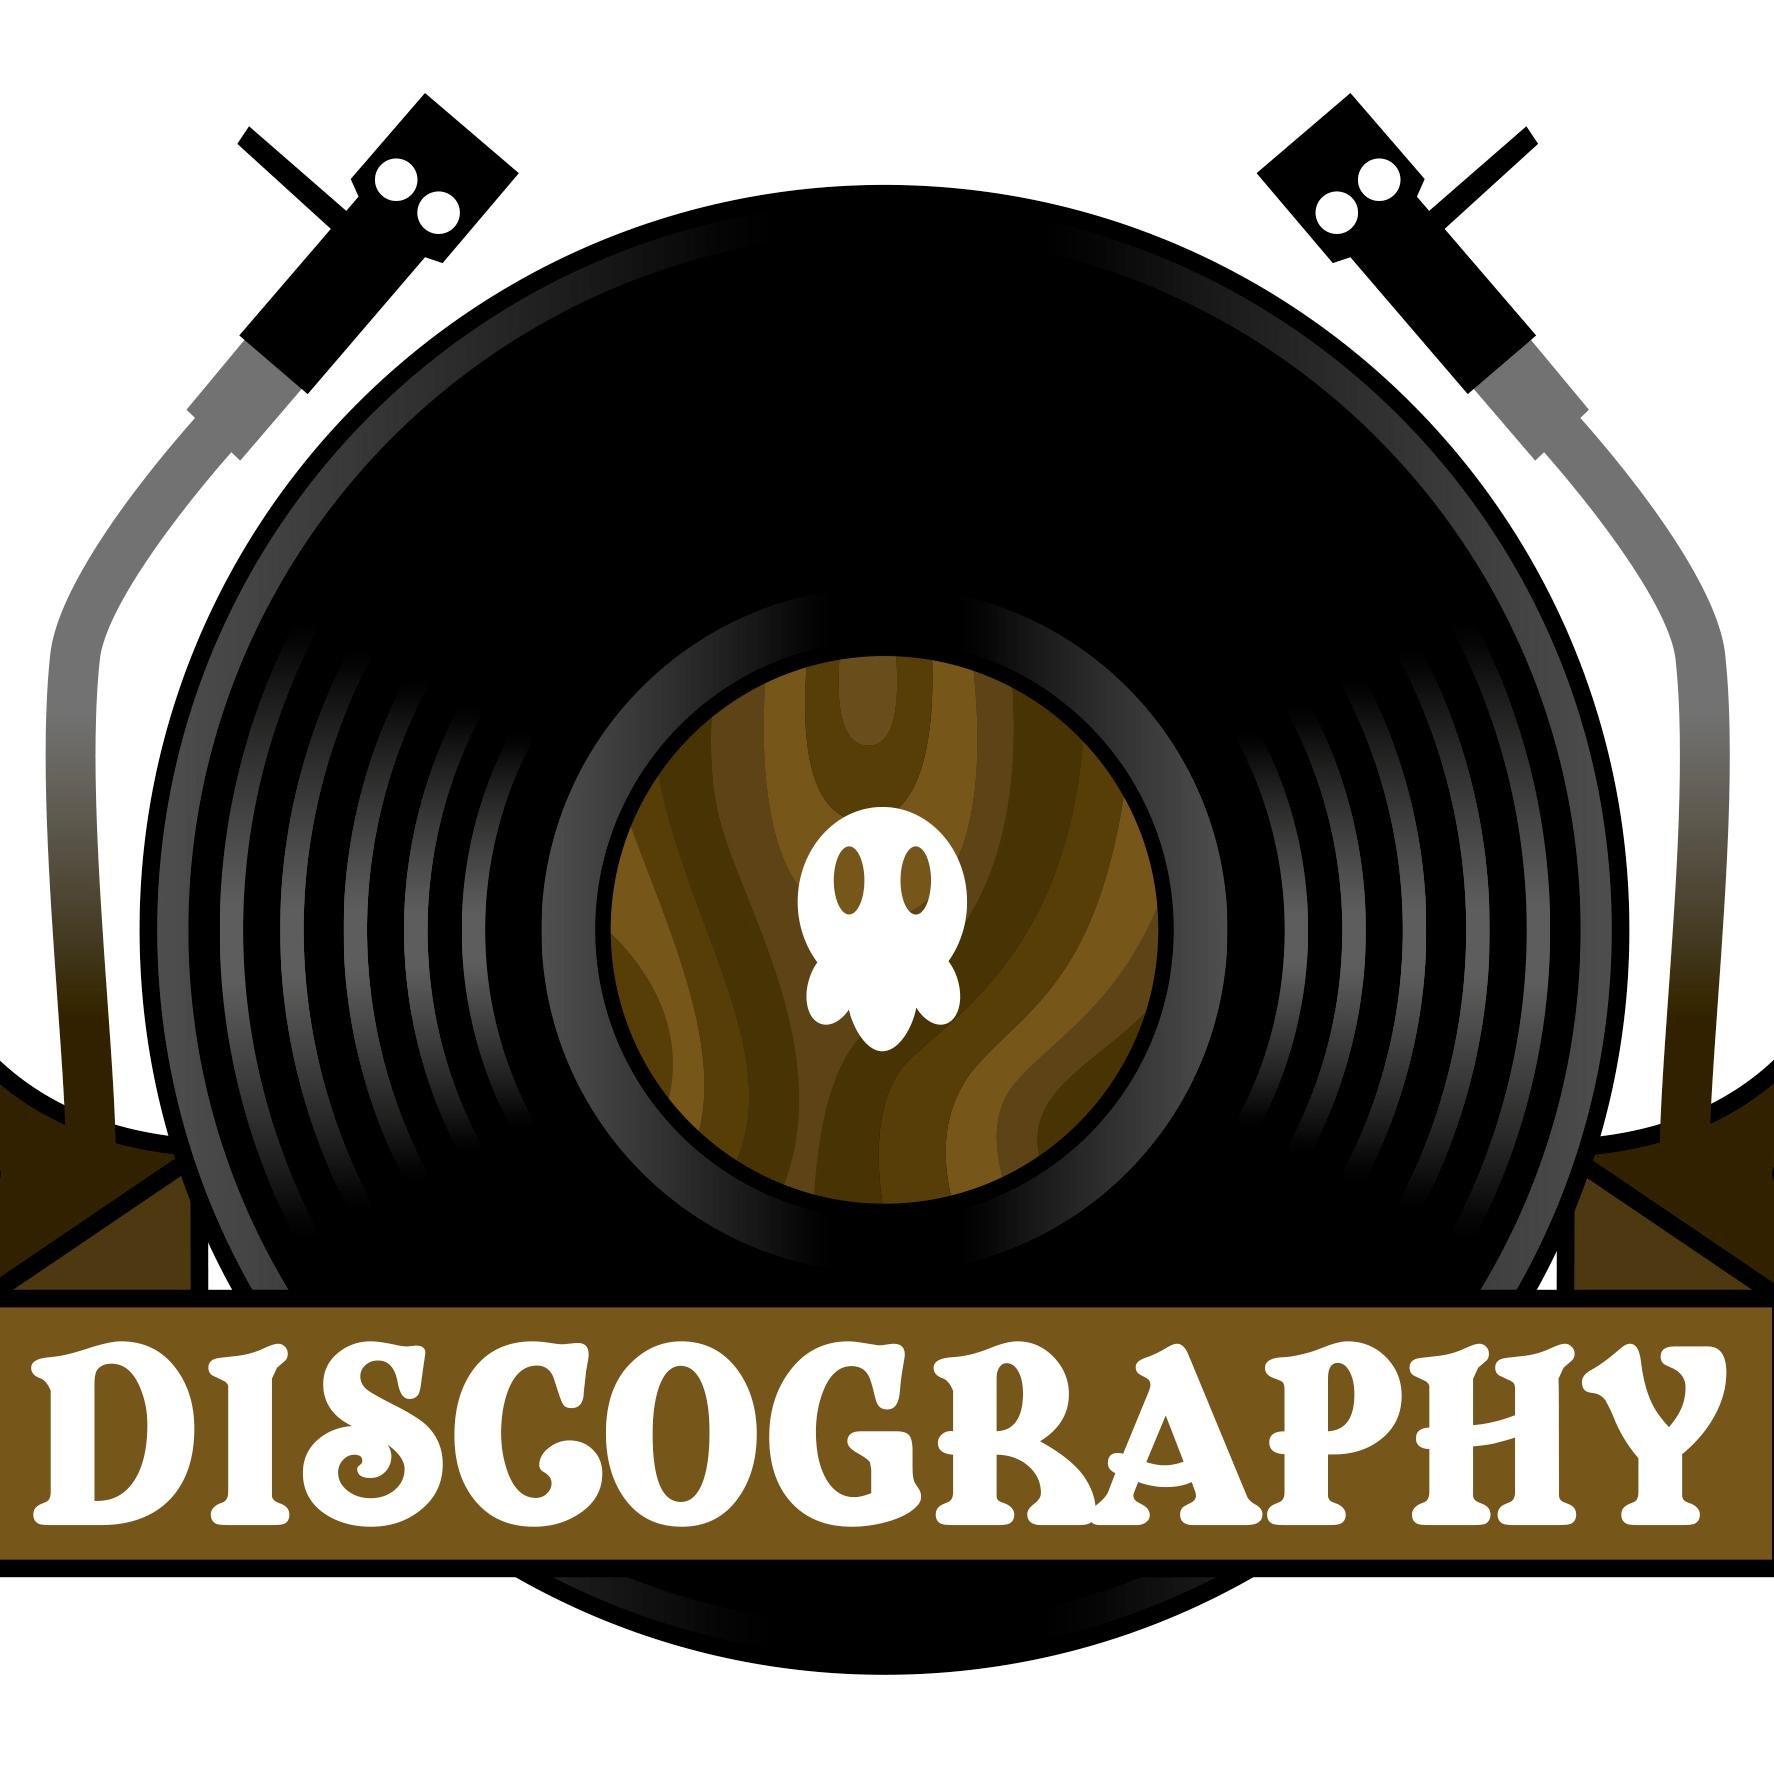 DISQOGRAPHY